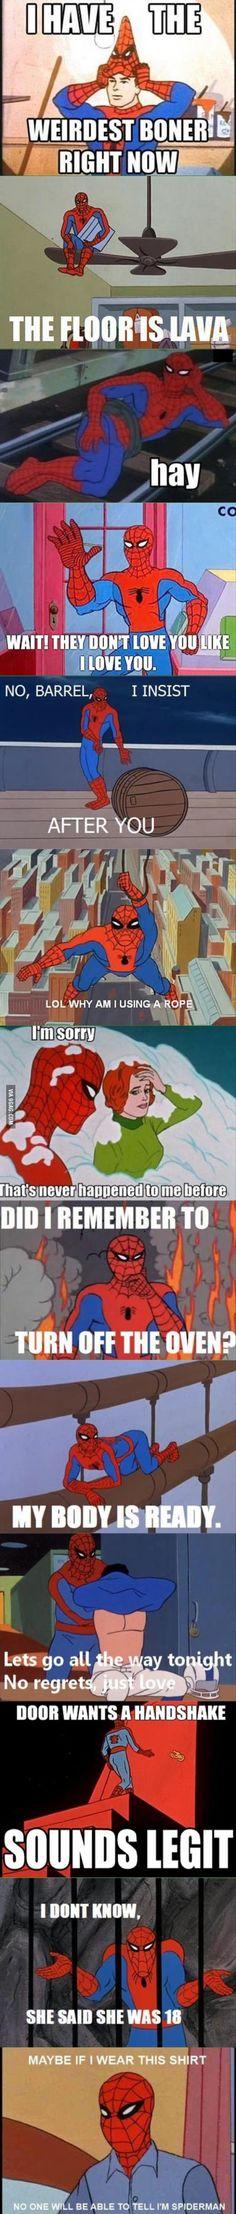 More Spiderman memes